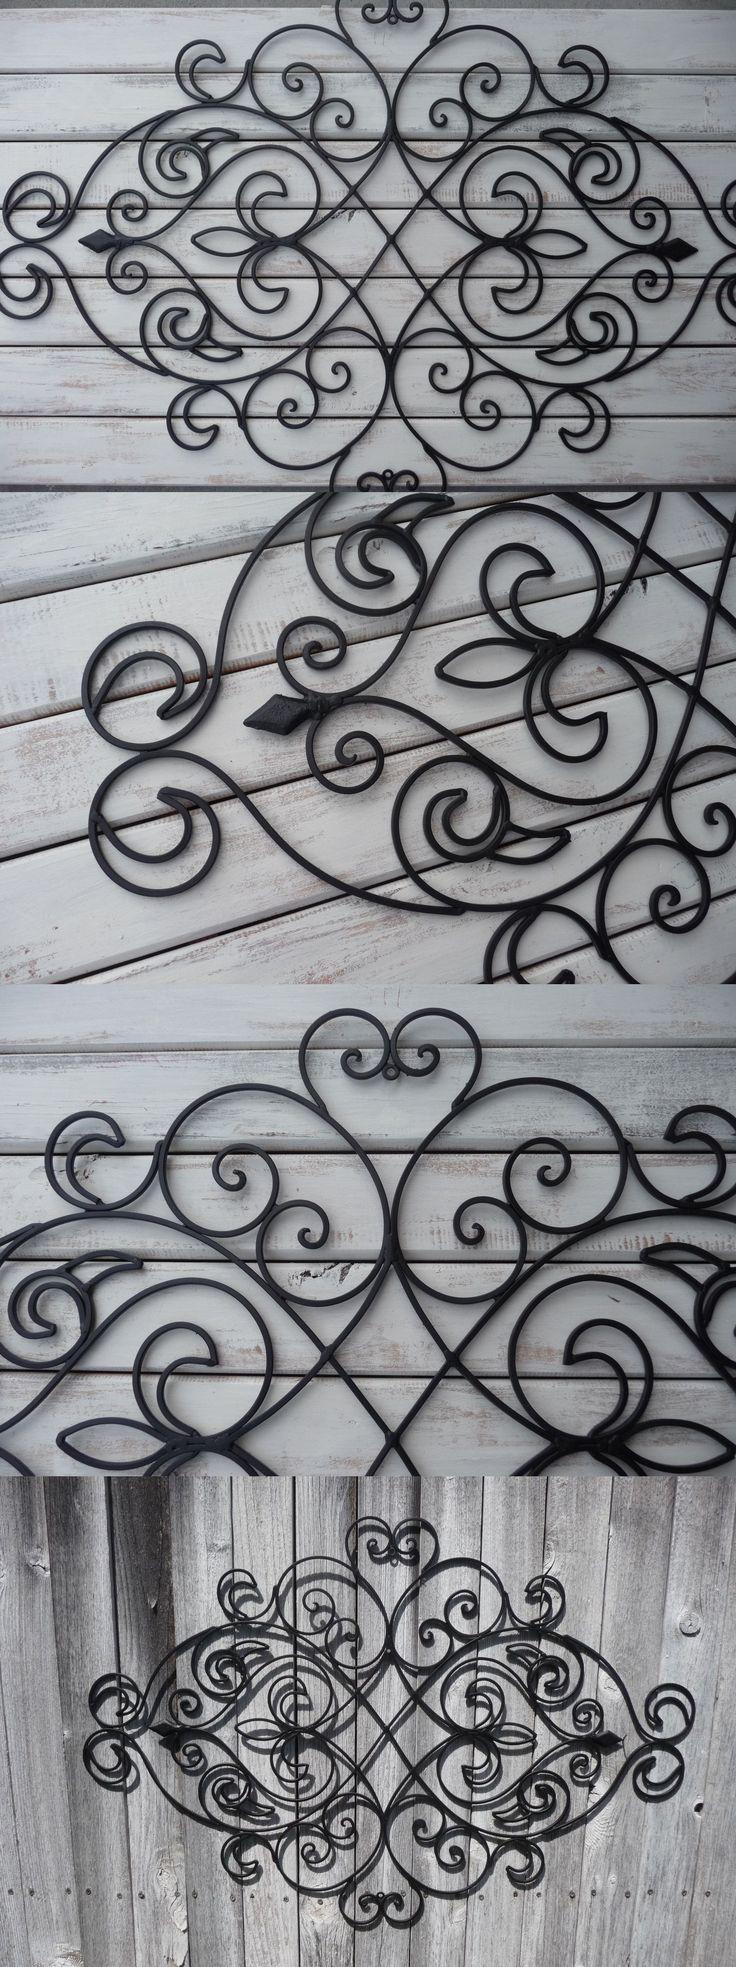 Home Decor: Wrought Iron Wall Decor ~ Bedroom Headboard ~ Black ~ Fleur De Lis ~ Shabby Chic BUY IT NOW ONLY: $44.99